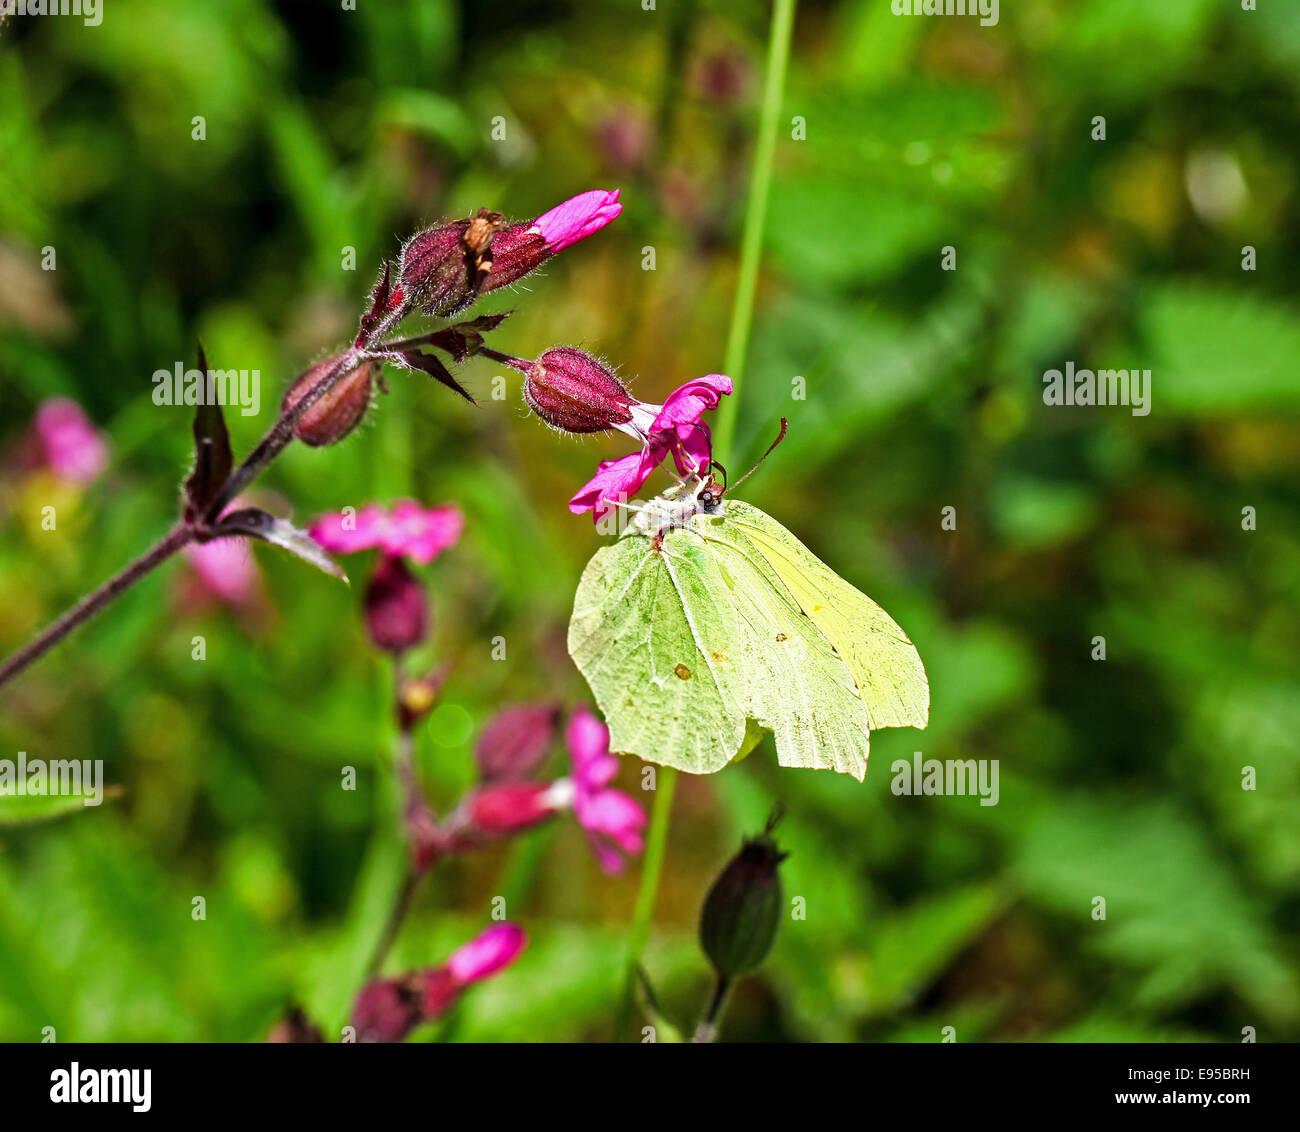 a-common-brimstone-butterfly-gonepteryx-rhamni-england-uk-E95BRH.jpg